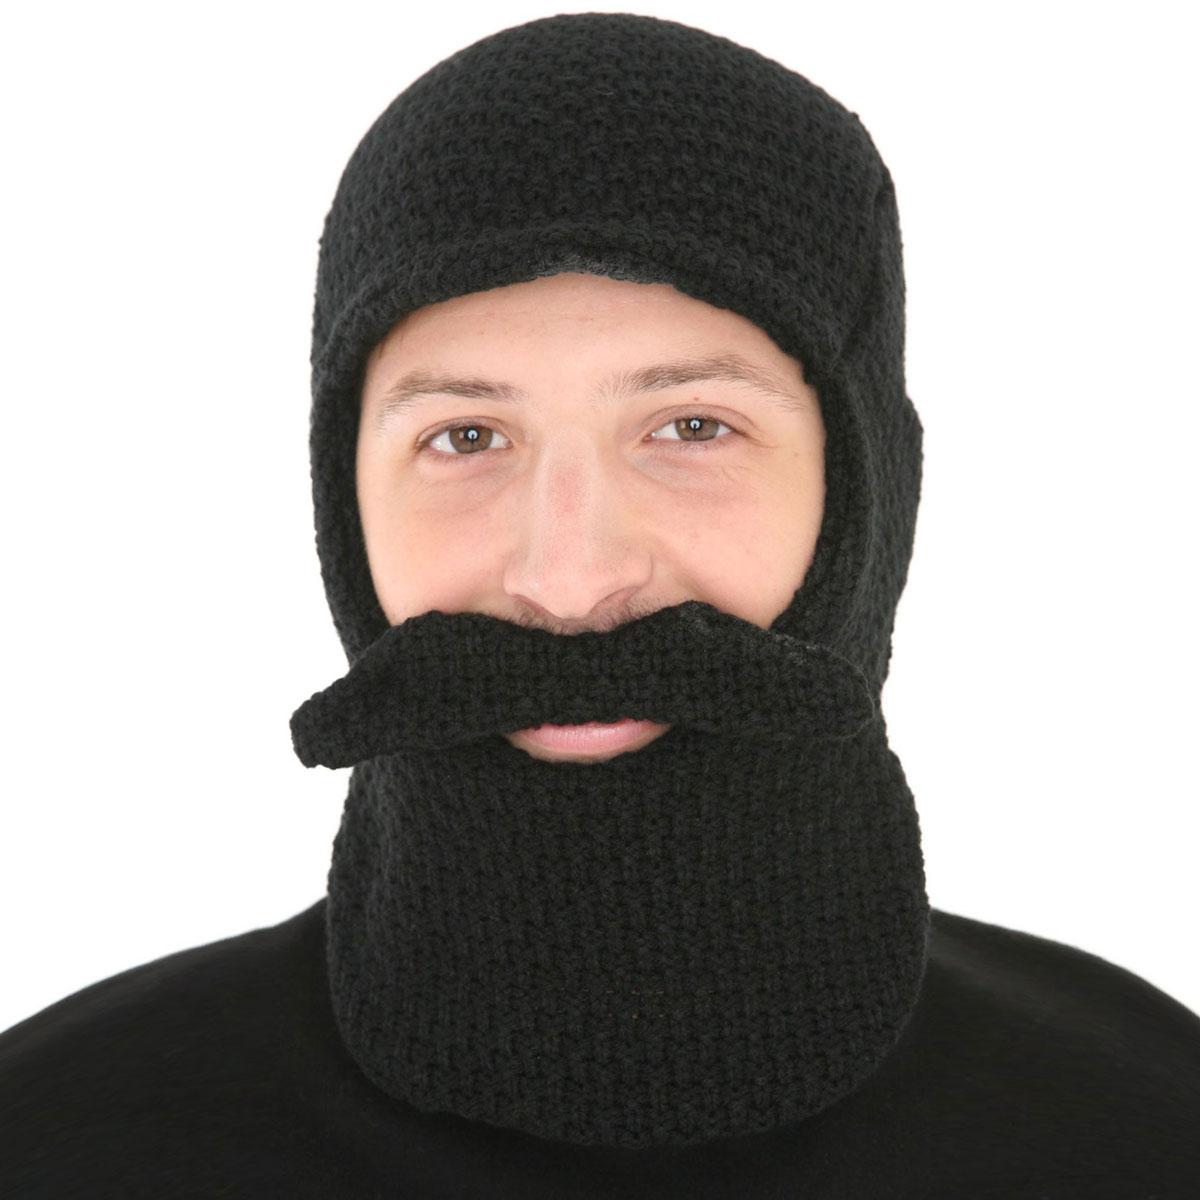 Beard Head Winter Caps 72431f9c1e8